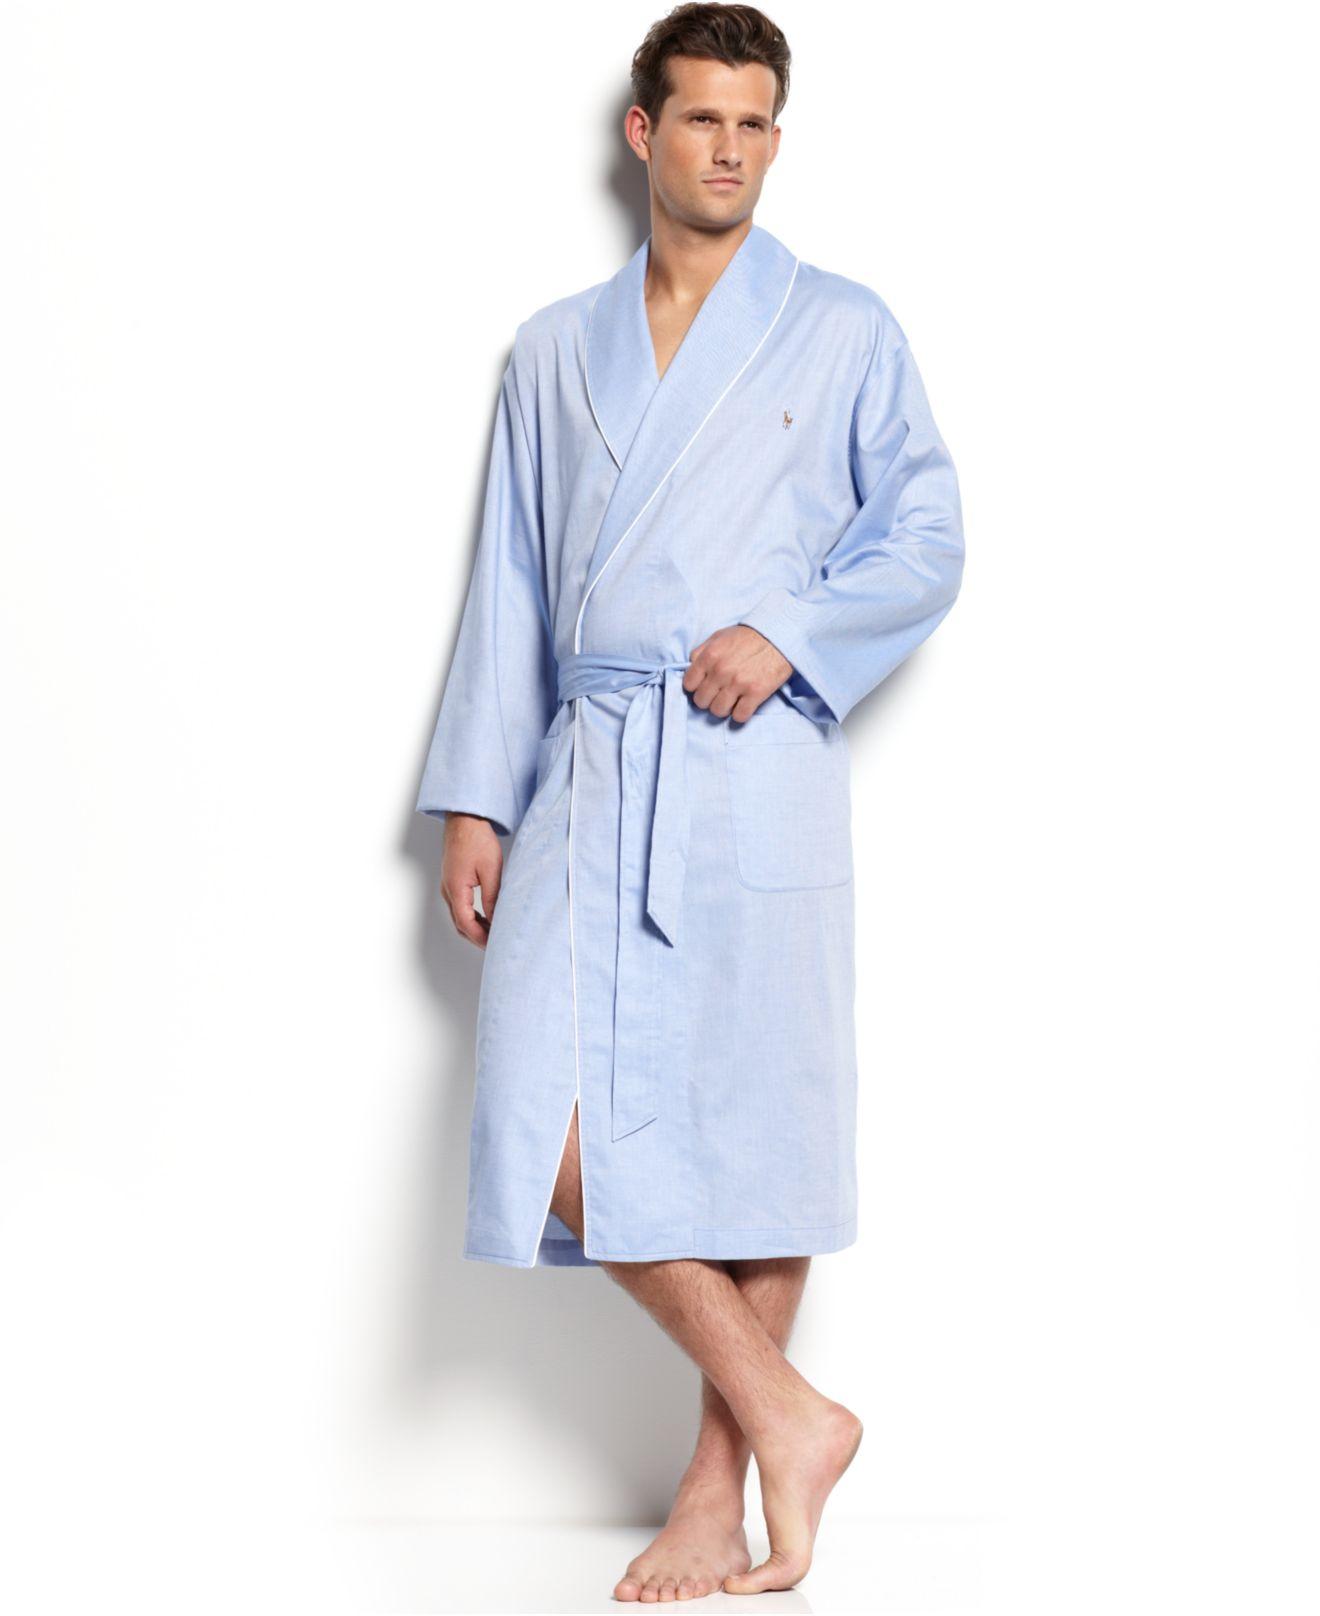 ... spain lyst polo ralph lauren mens woven oxford robe in blue for men  14630 4429b 06909c57f